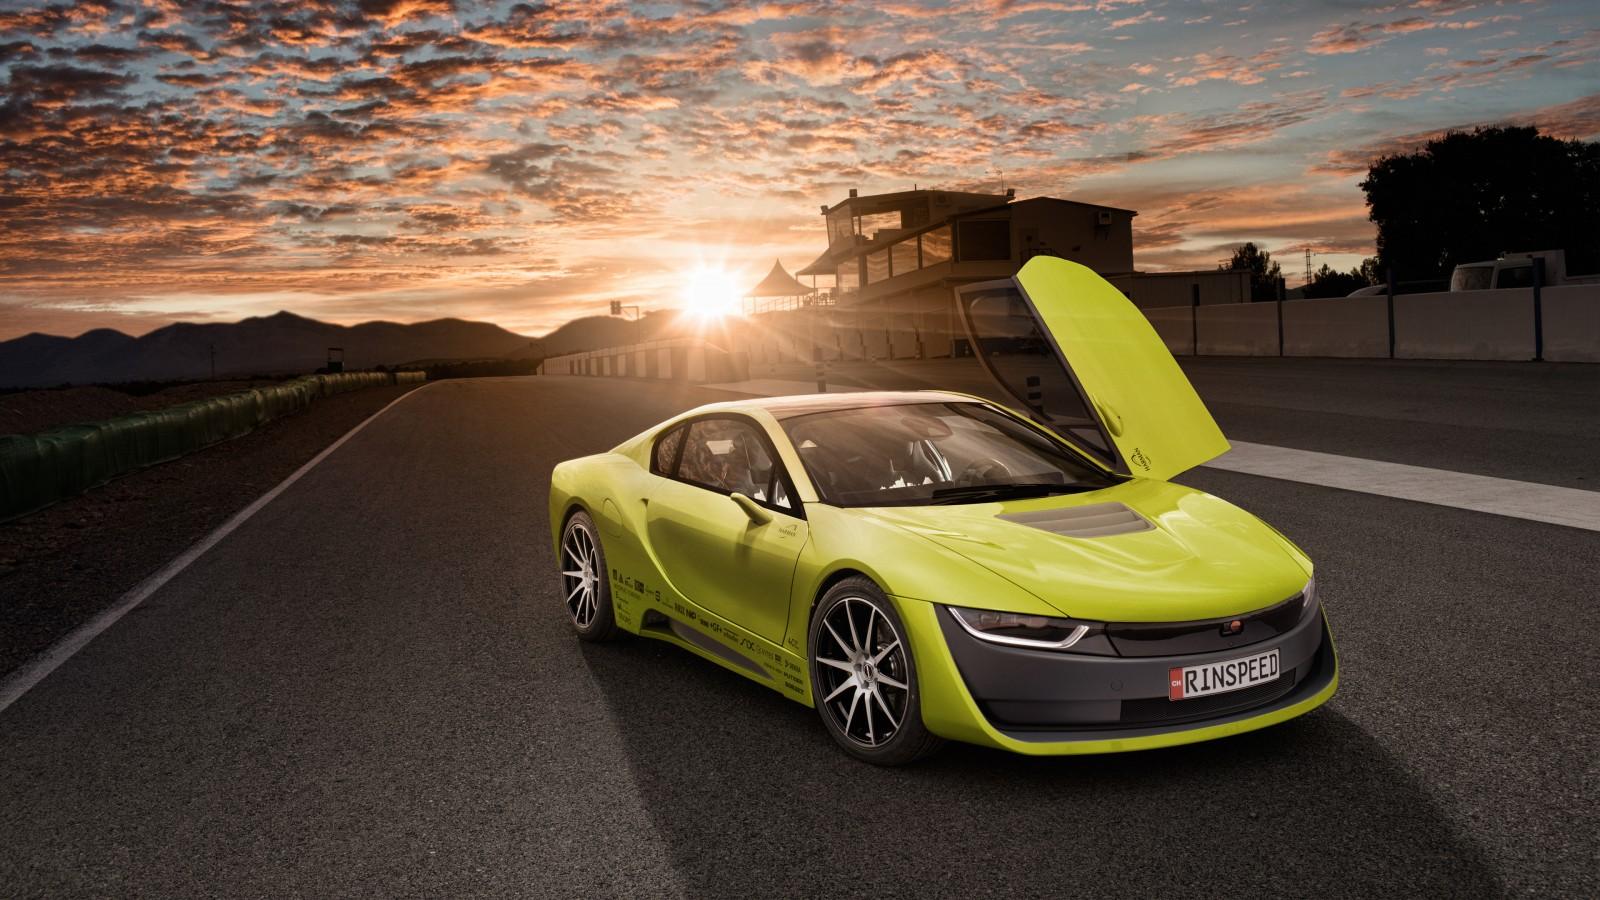 Bmw I8 Car Concept 4k Hd Desktop Wallpaper For 4k Ultra Hd: Rinspeed Etos Concept BMW I8 Self Driving Car Wallpaper